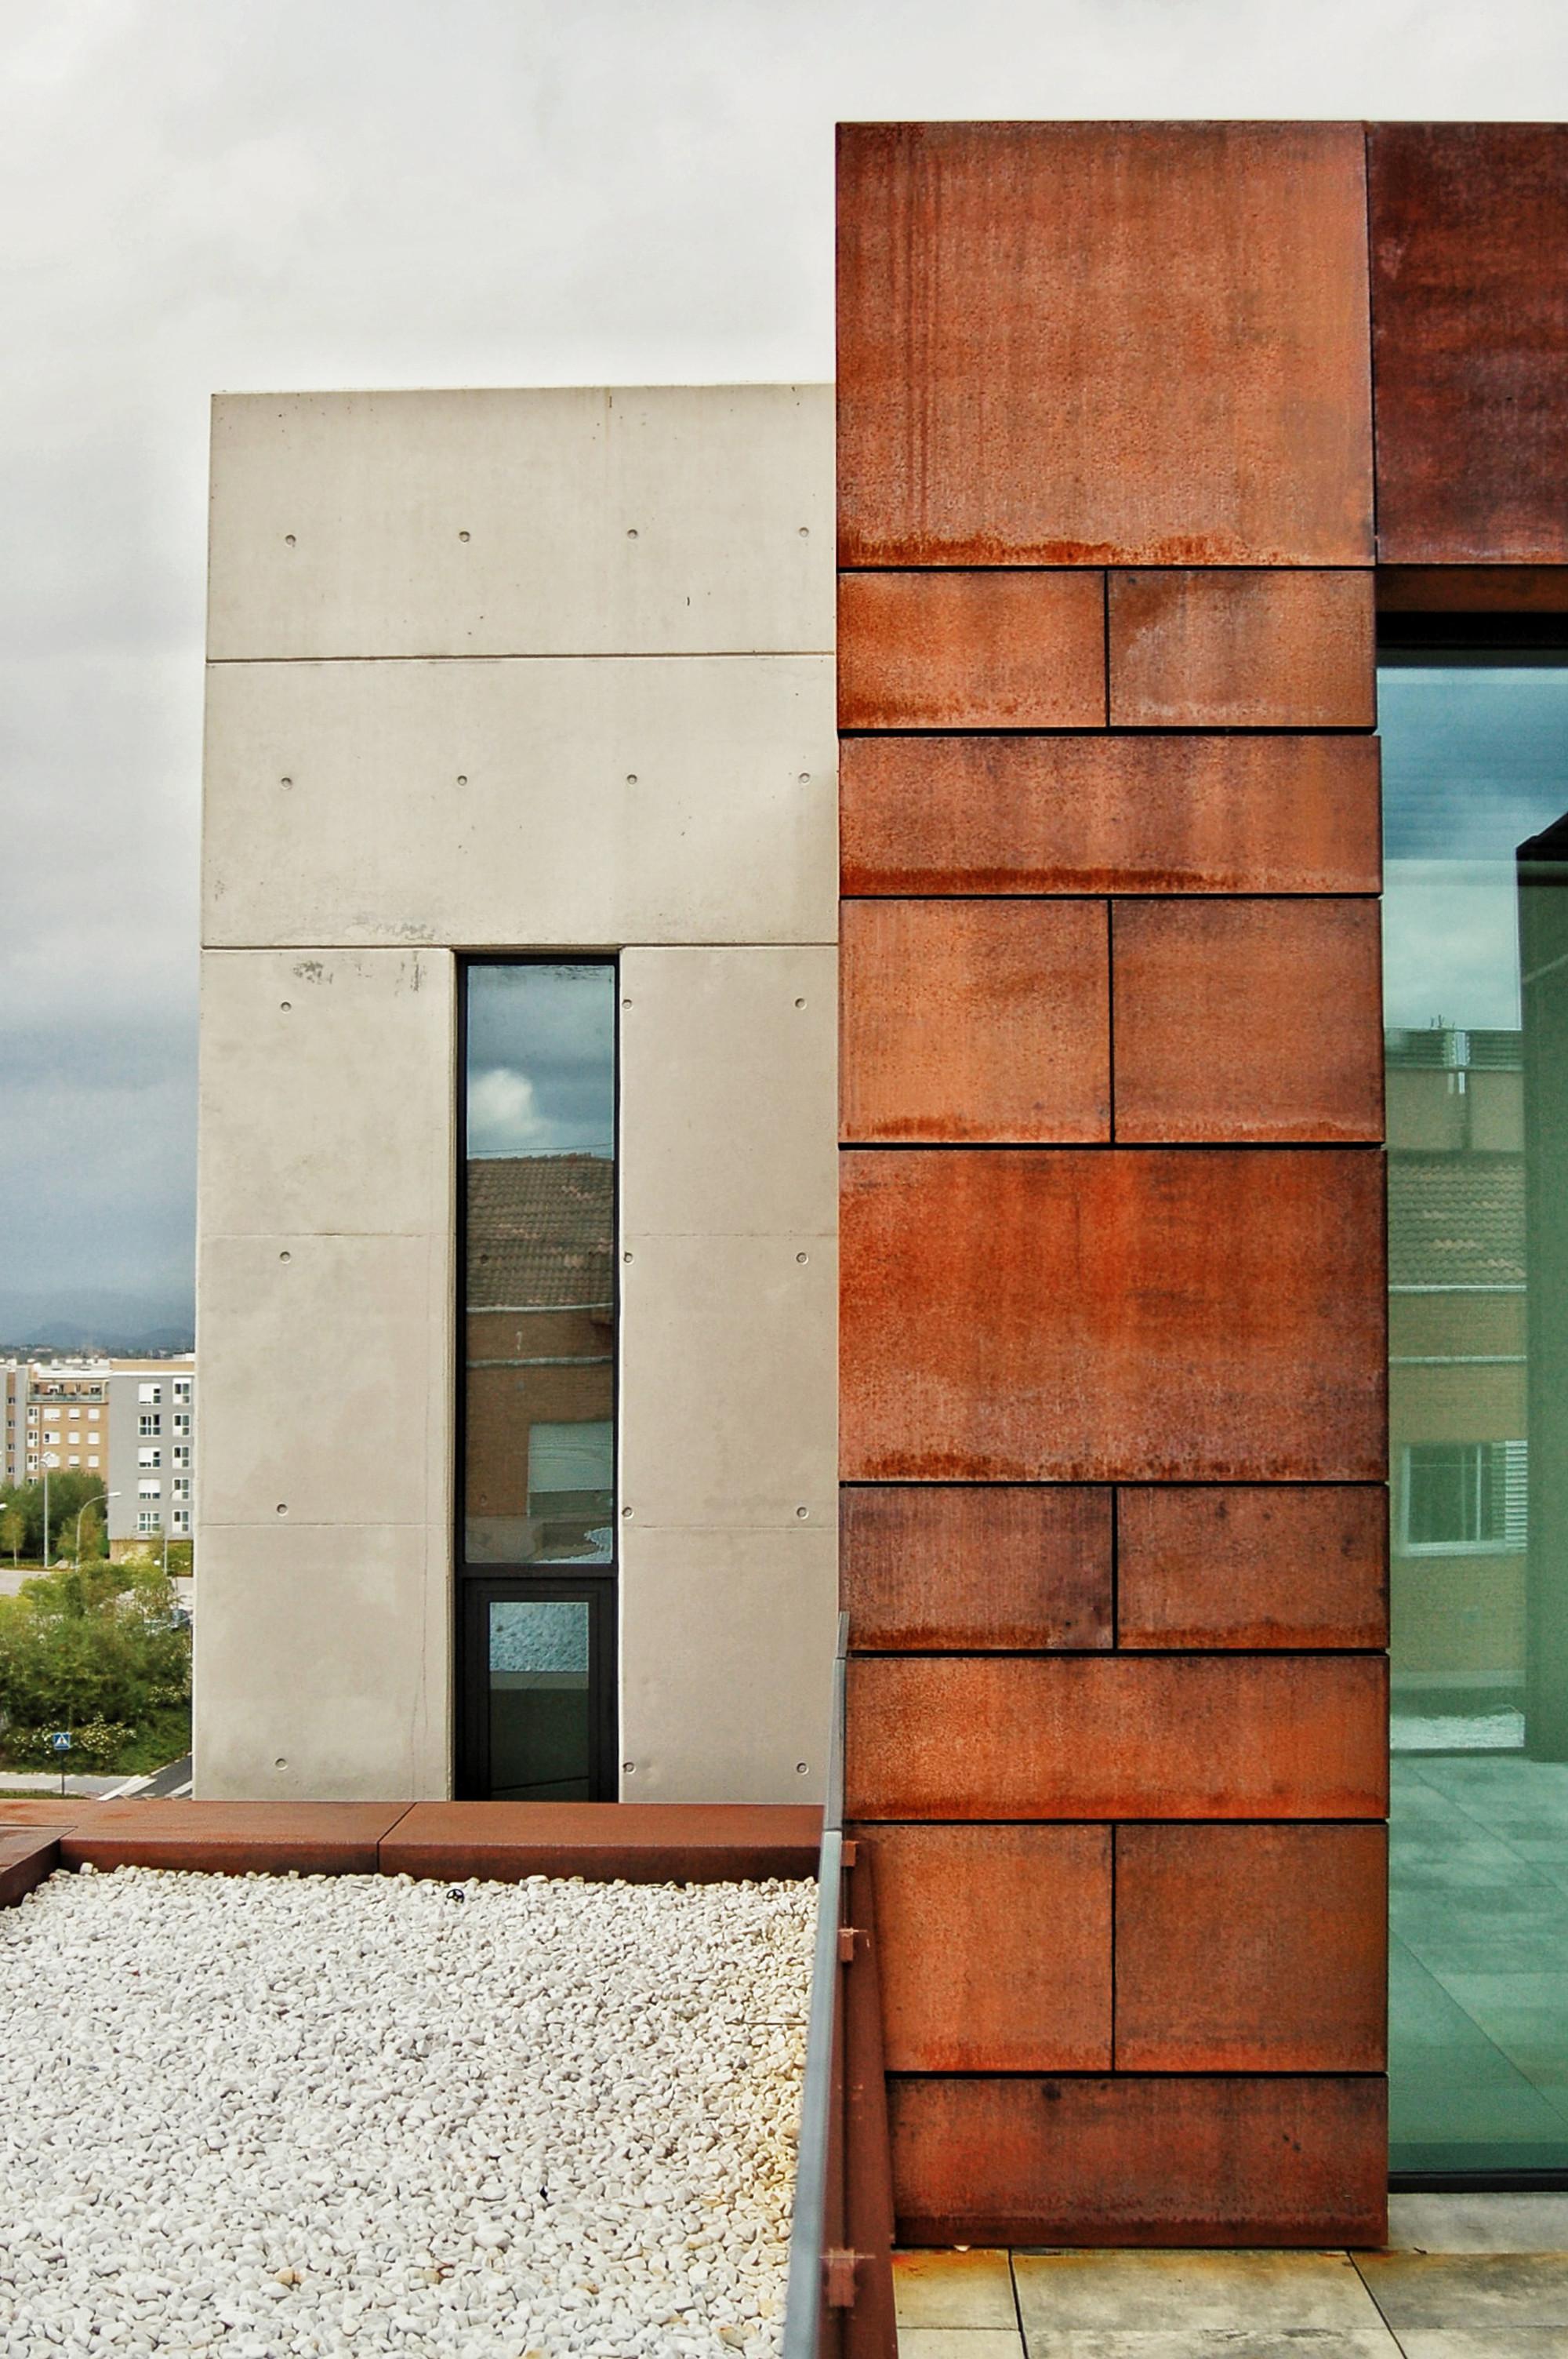 Galer a de edificio de oficinas en vitoria lh14 arquitectos 5 - Arquitectos en vitoria ...